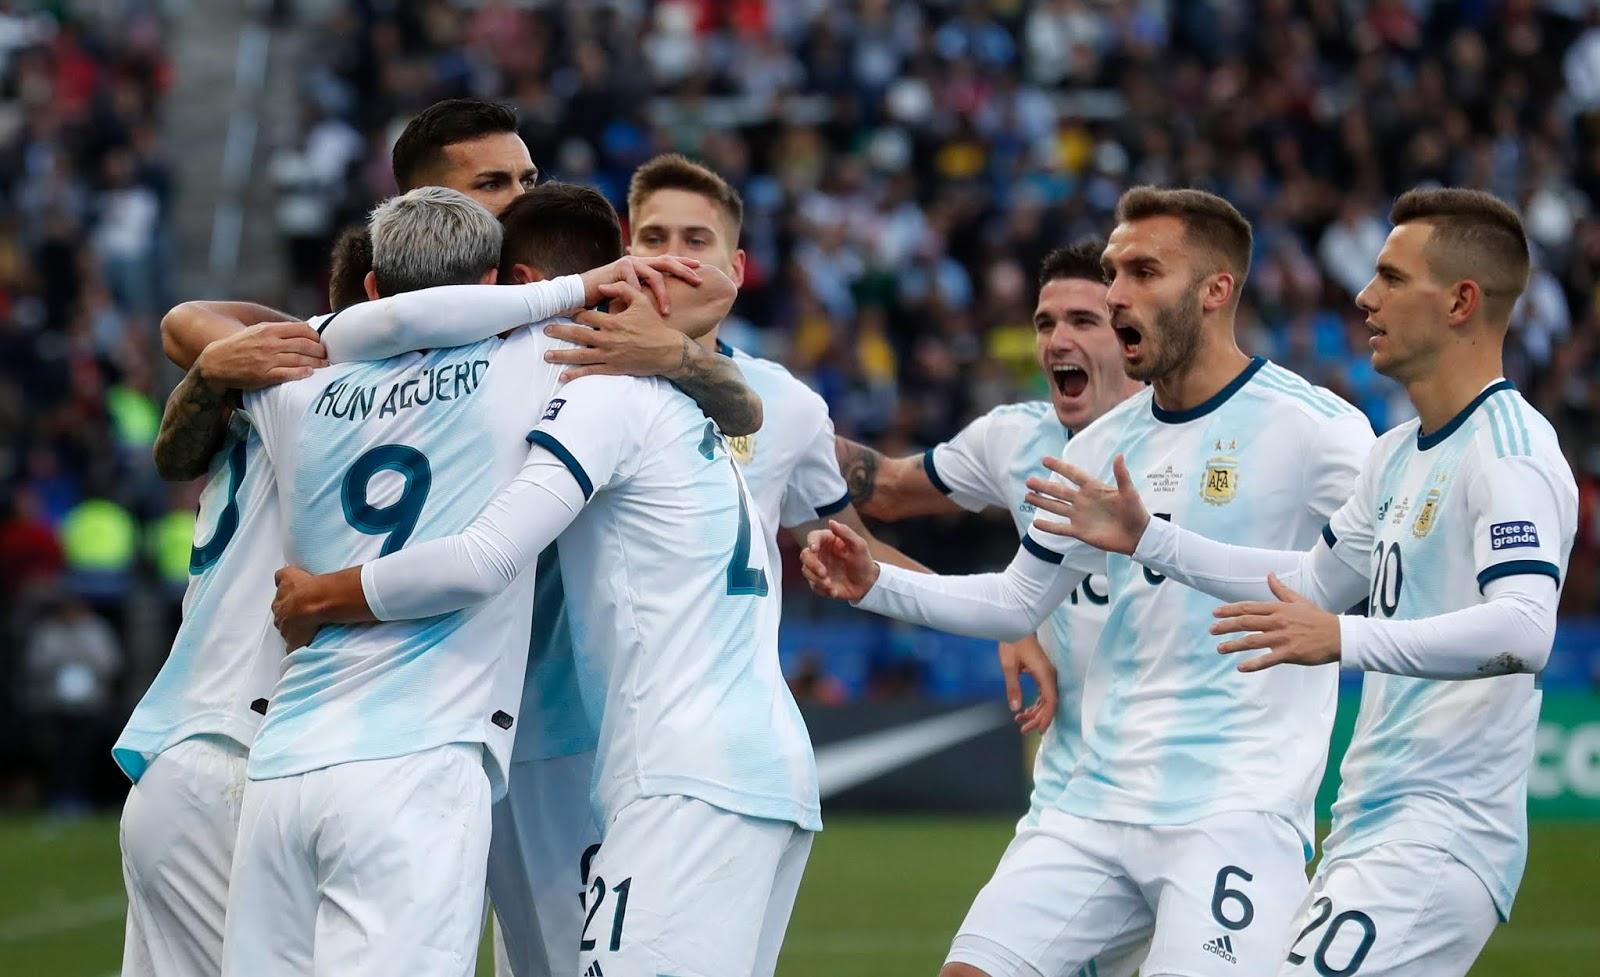 Argentina Chile Tercer puesto de Copa America